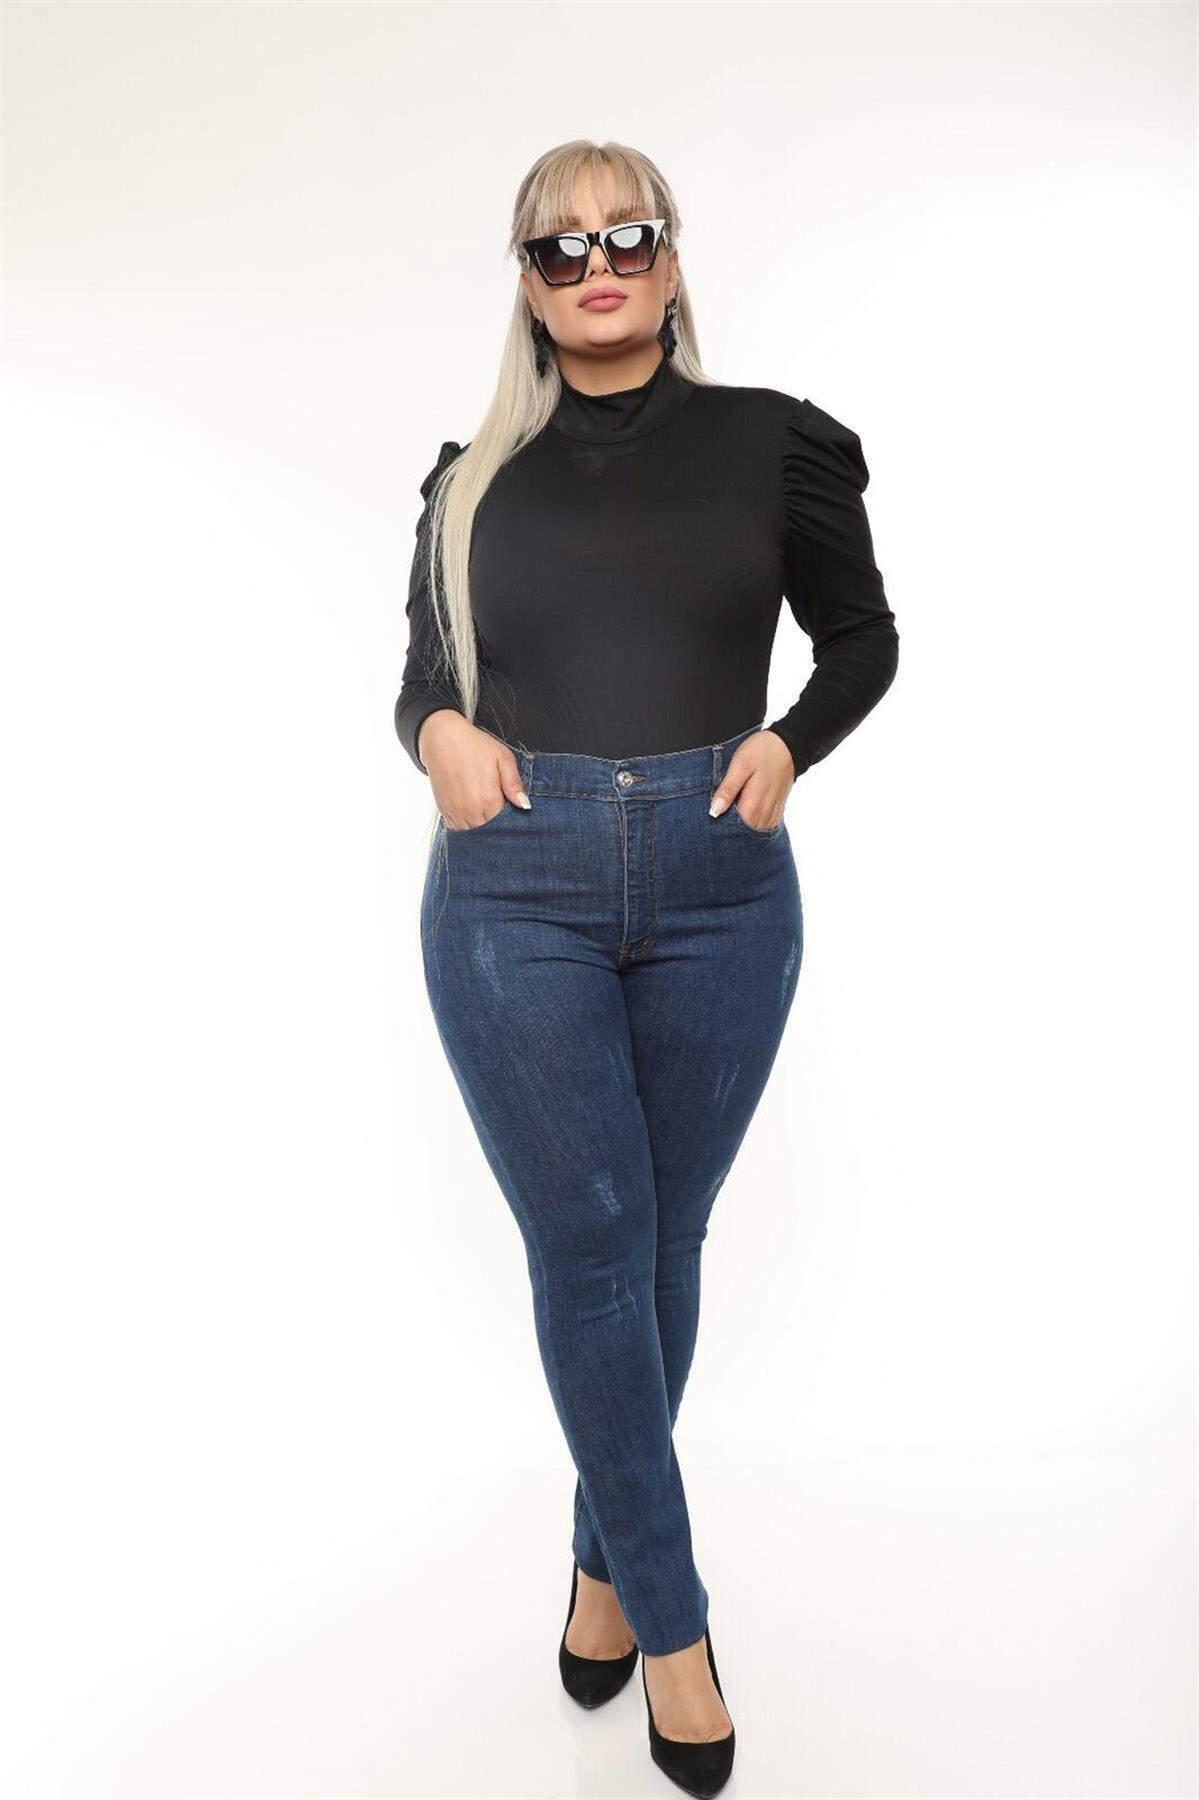 Büyük Beden Dizleri Eskitme Detay Esnek Kot Pantolon MT4721 Mavi